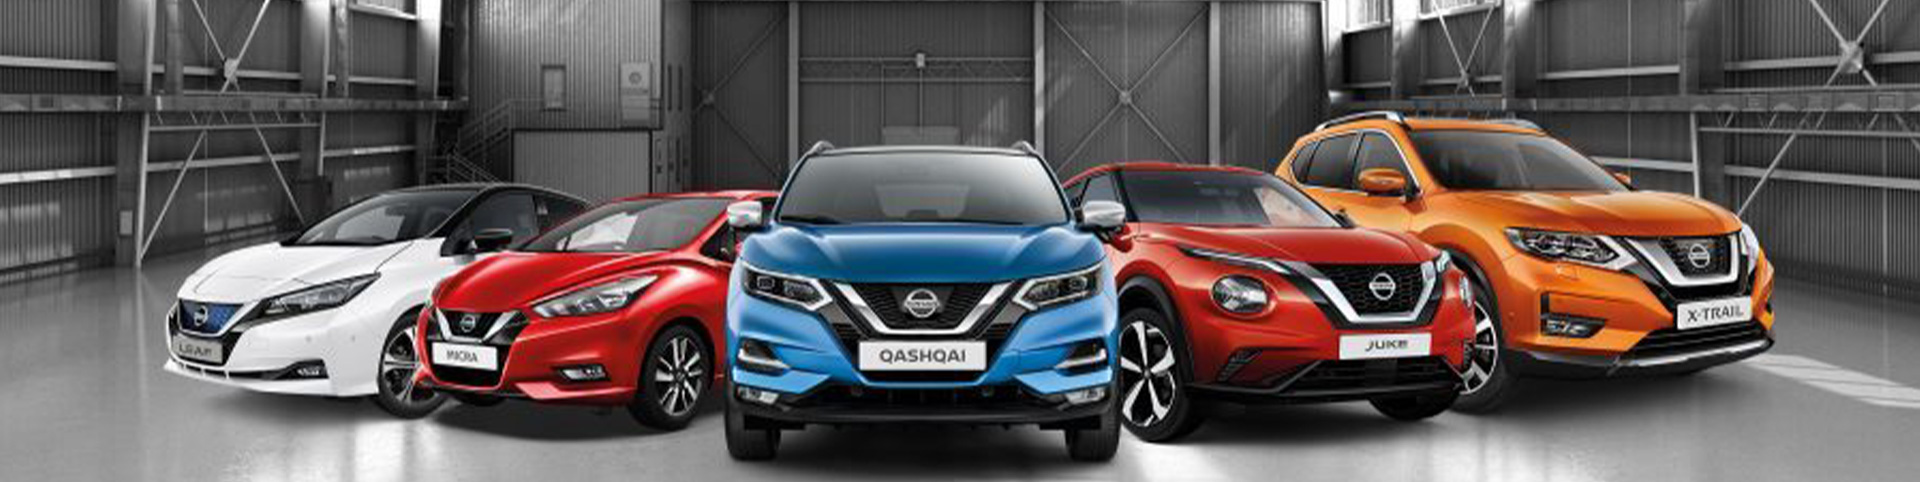 Nissan Range Autozentren P&A-Preckel